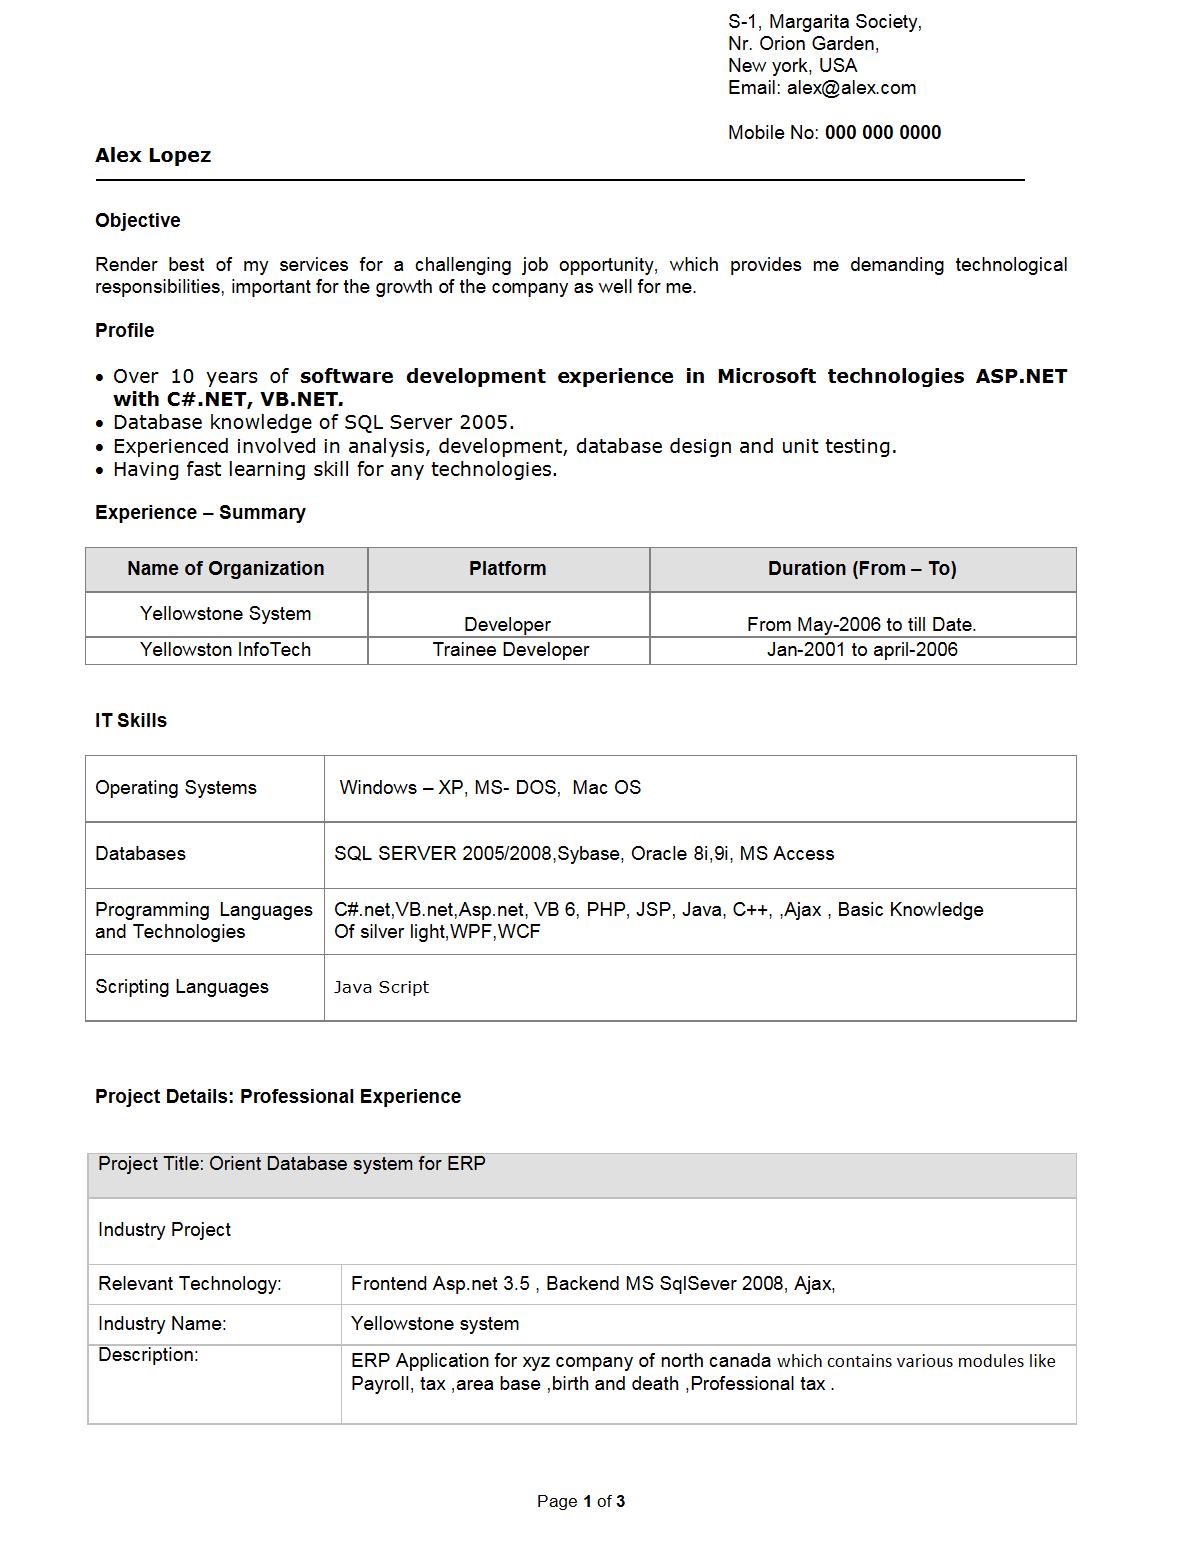 Job resume samples Job resume Resume format Software